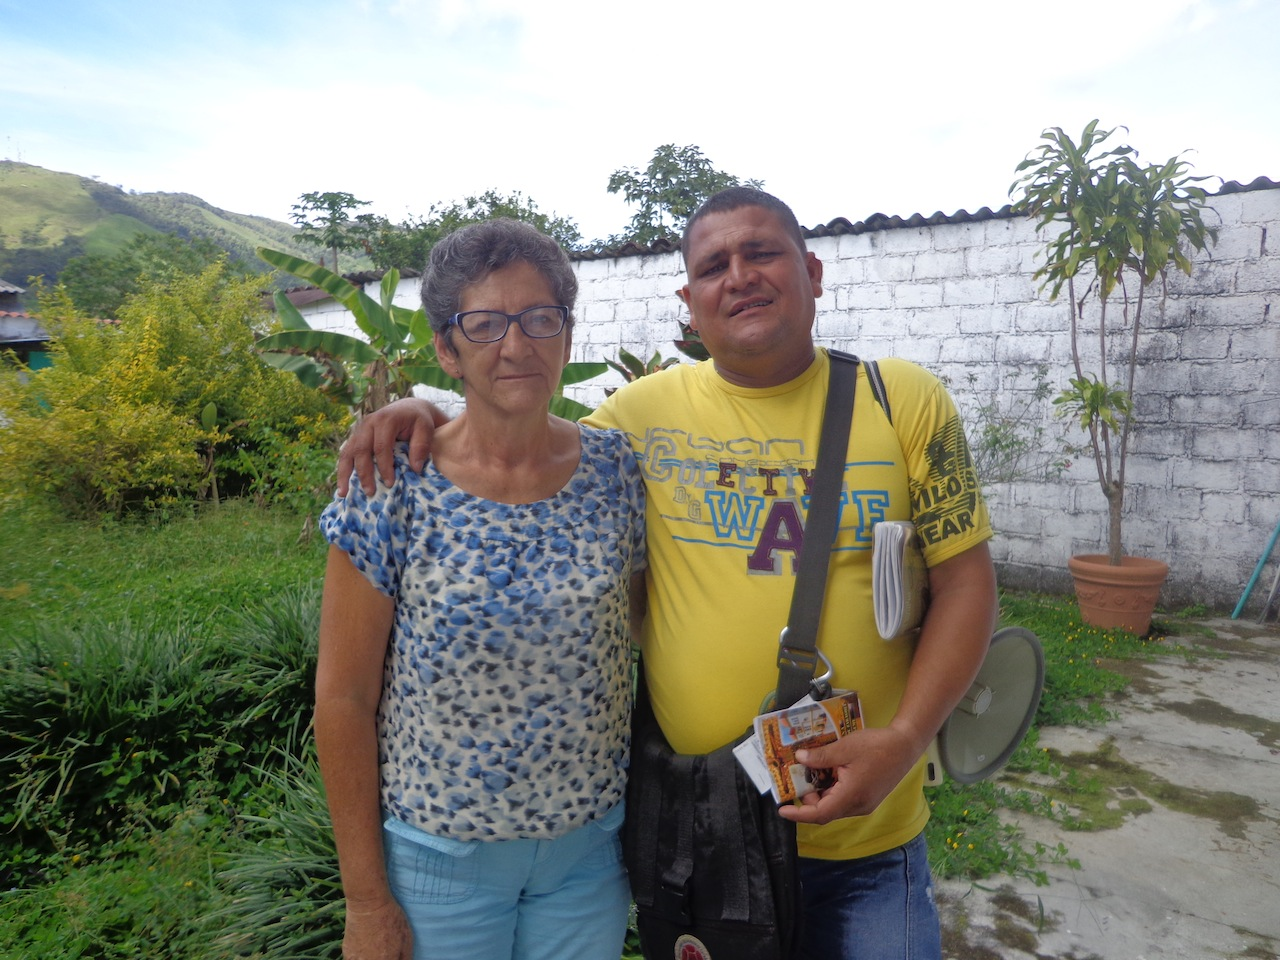 colombia_vrede_foto_290615.jpg